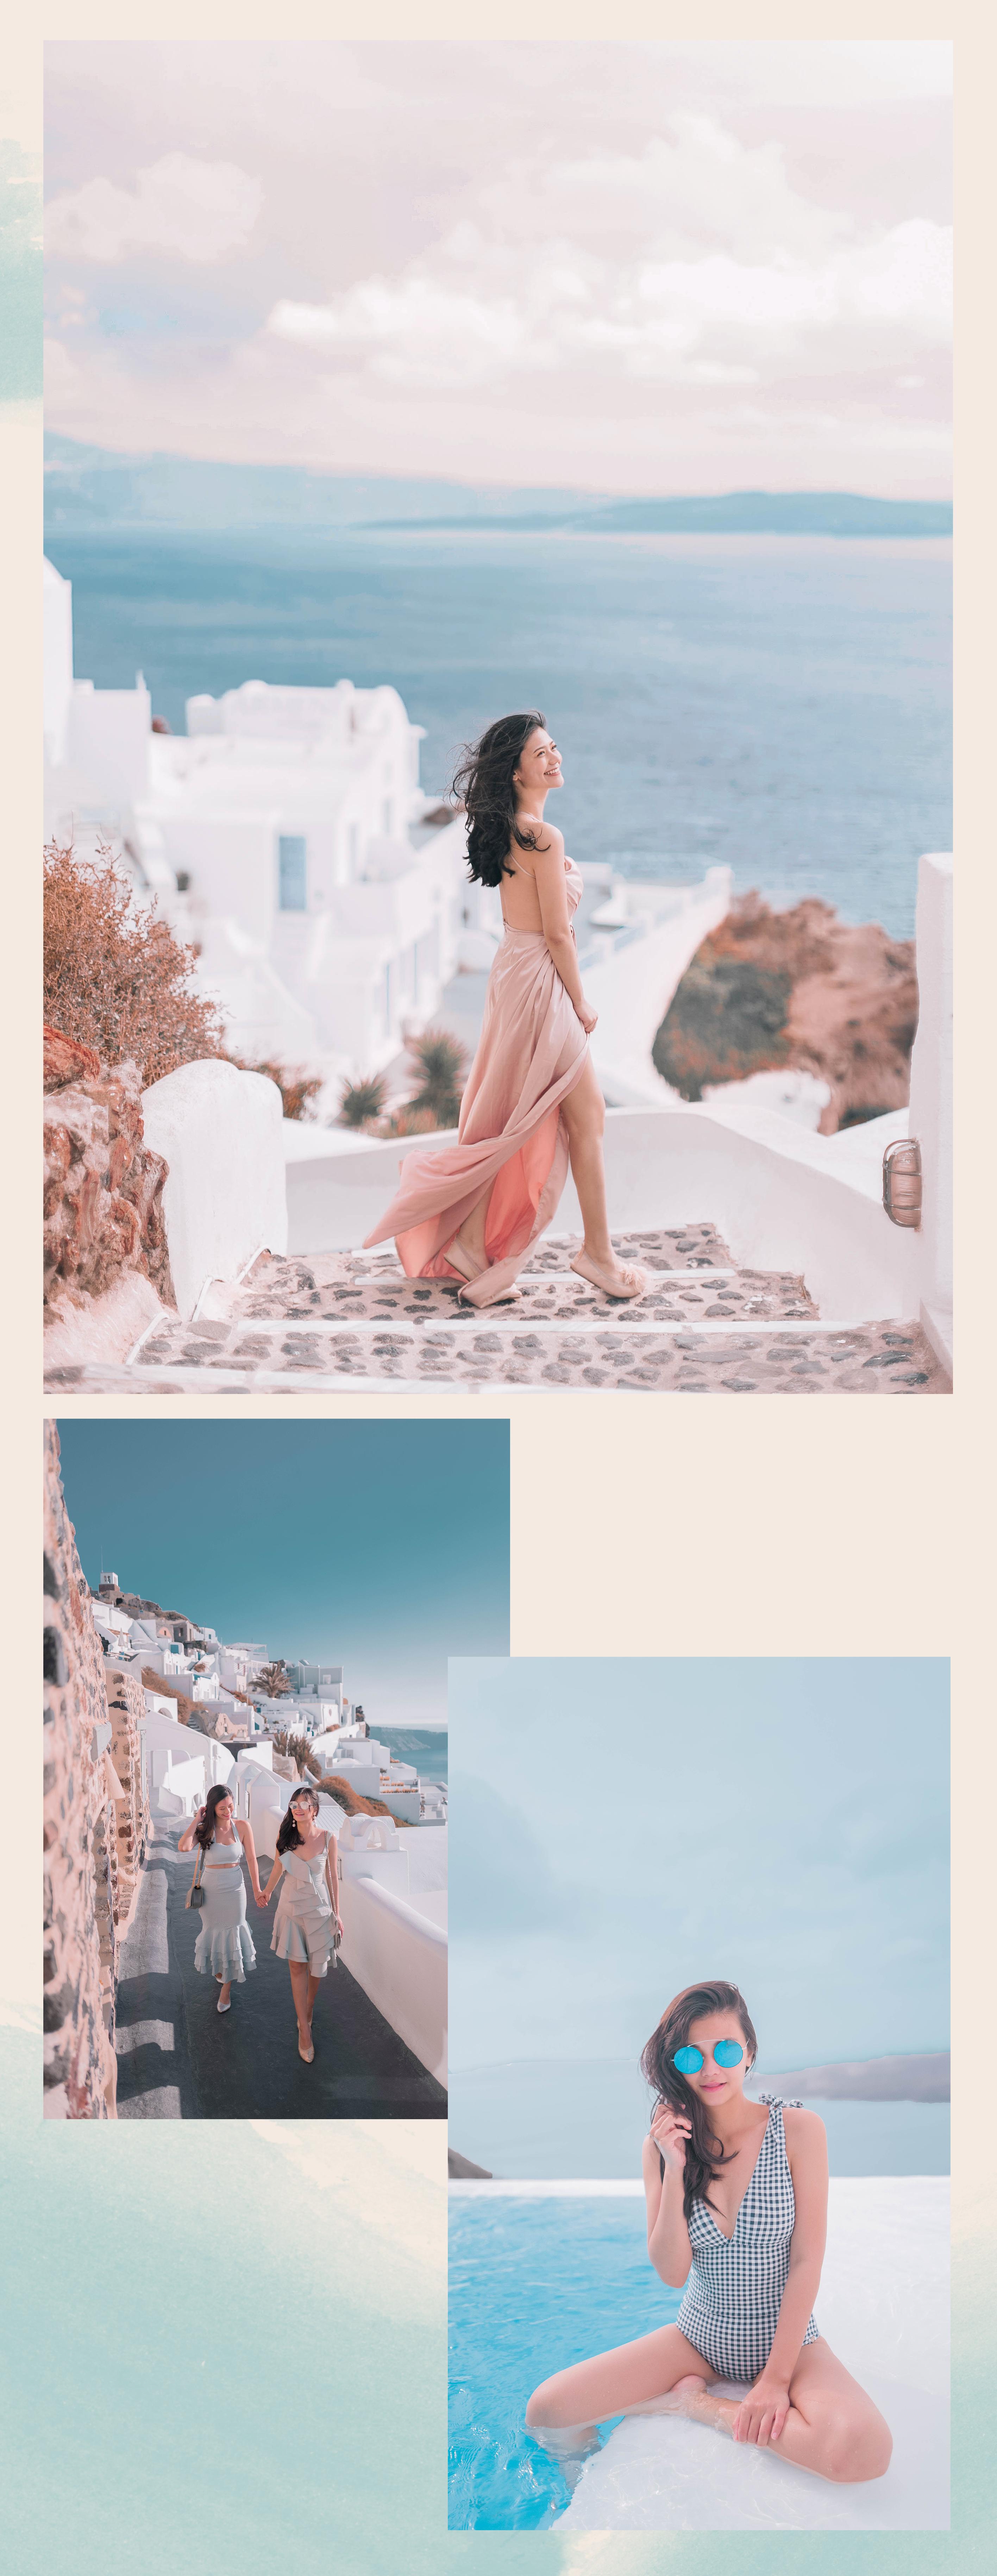 7. VnV Greece 3